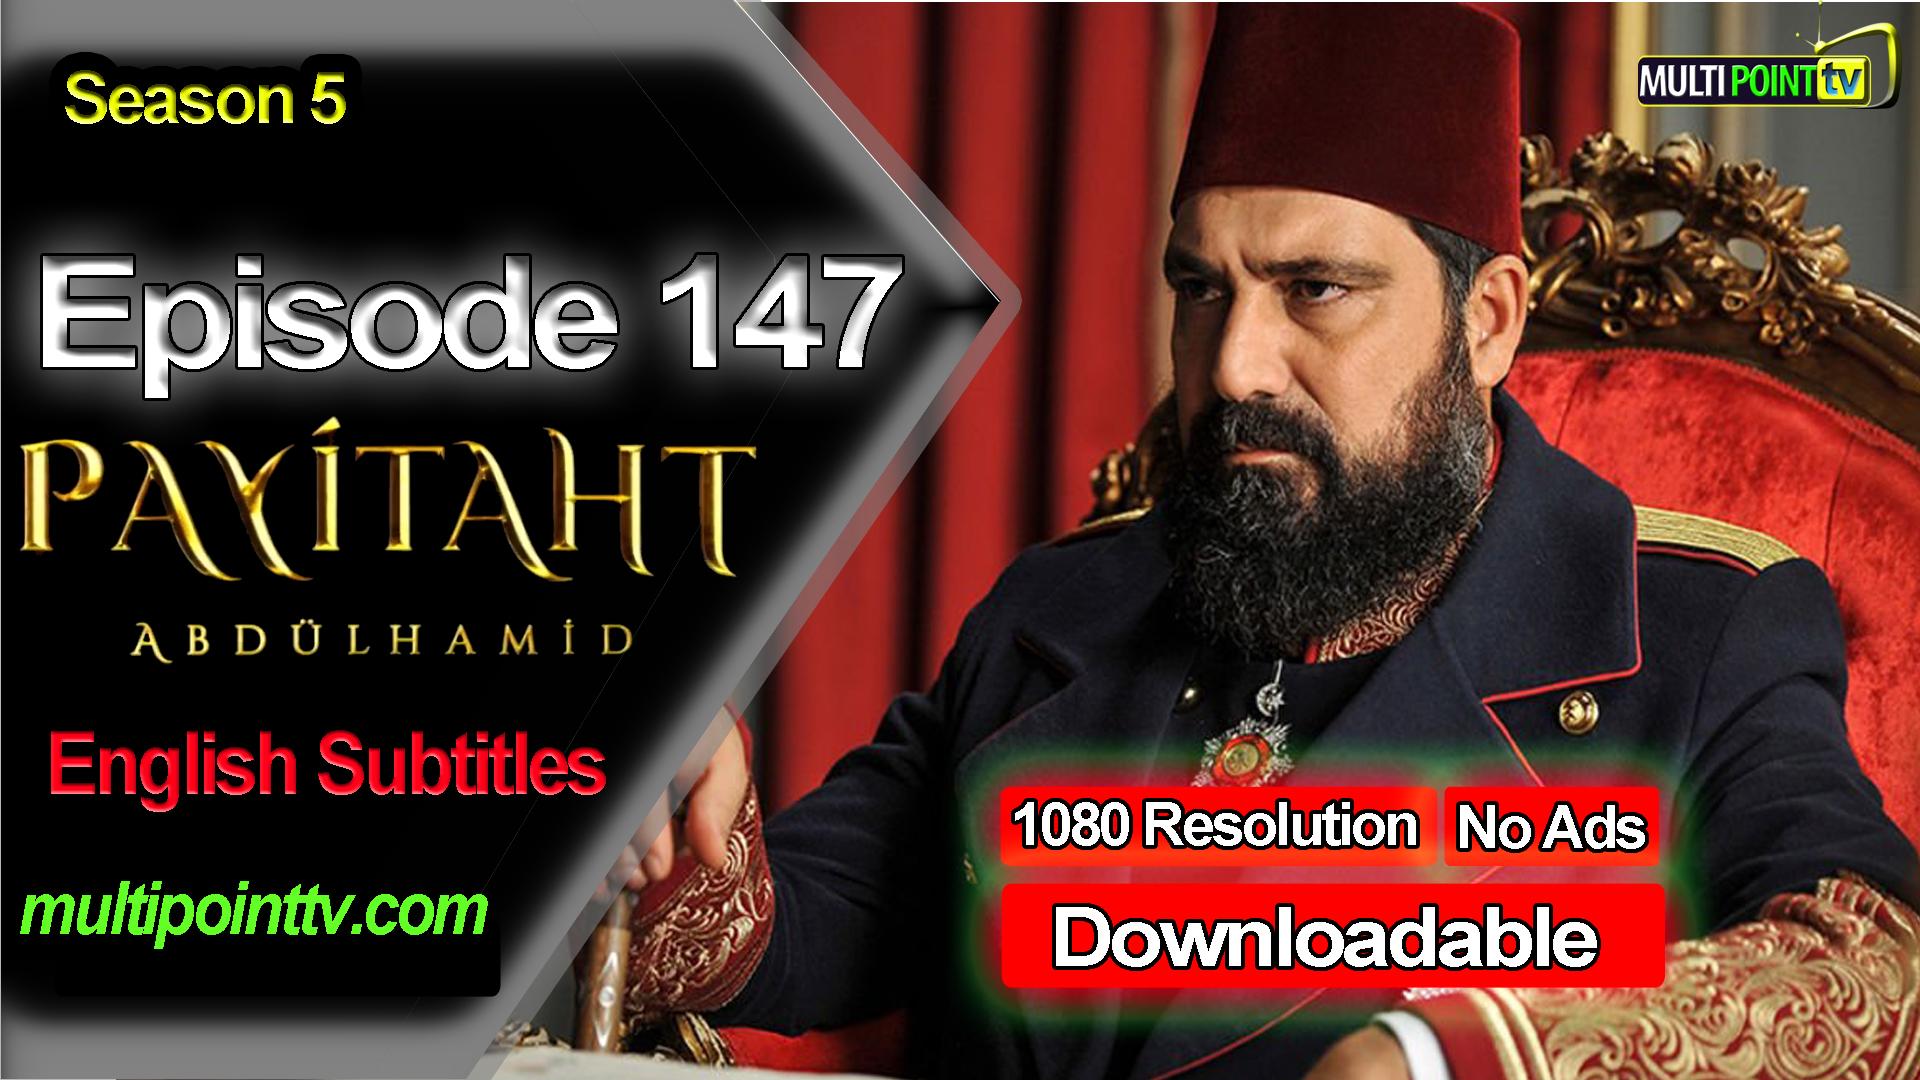 Payitaht Abdulhamid Episode 147 English Subtitles